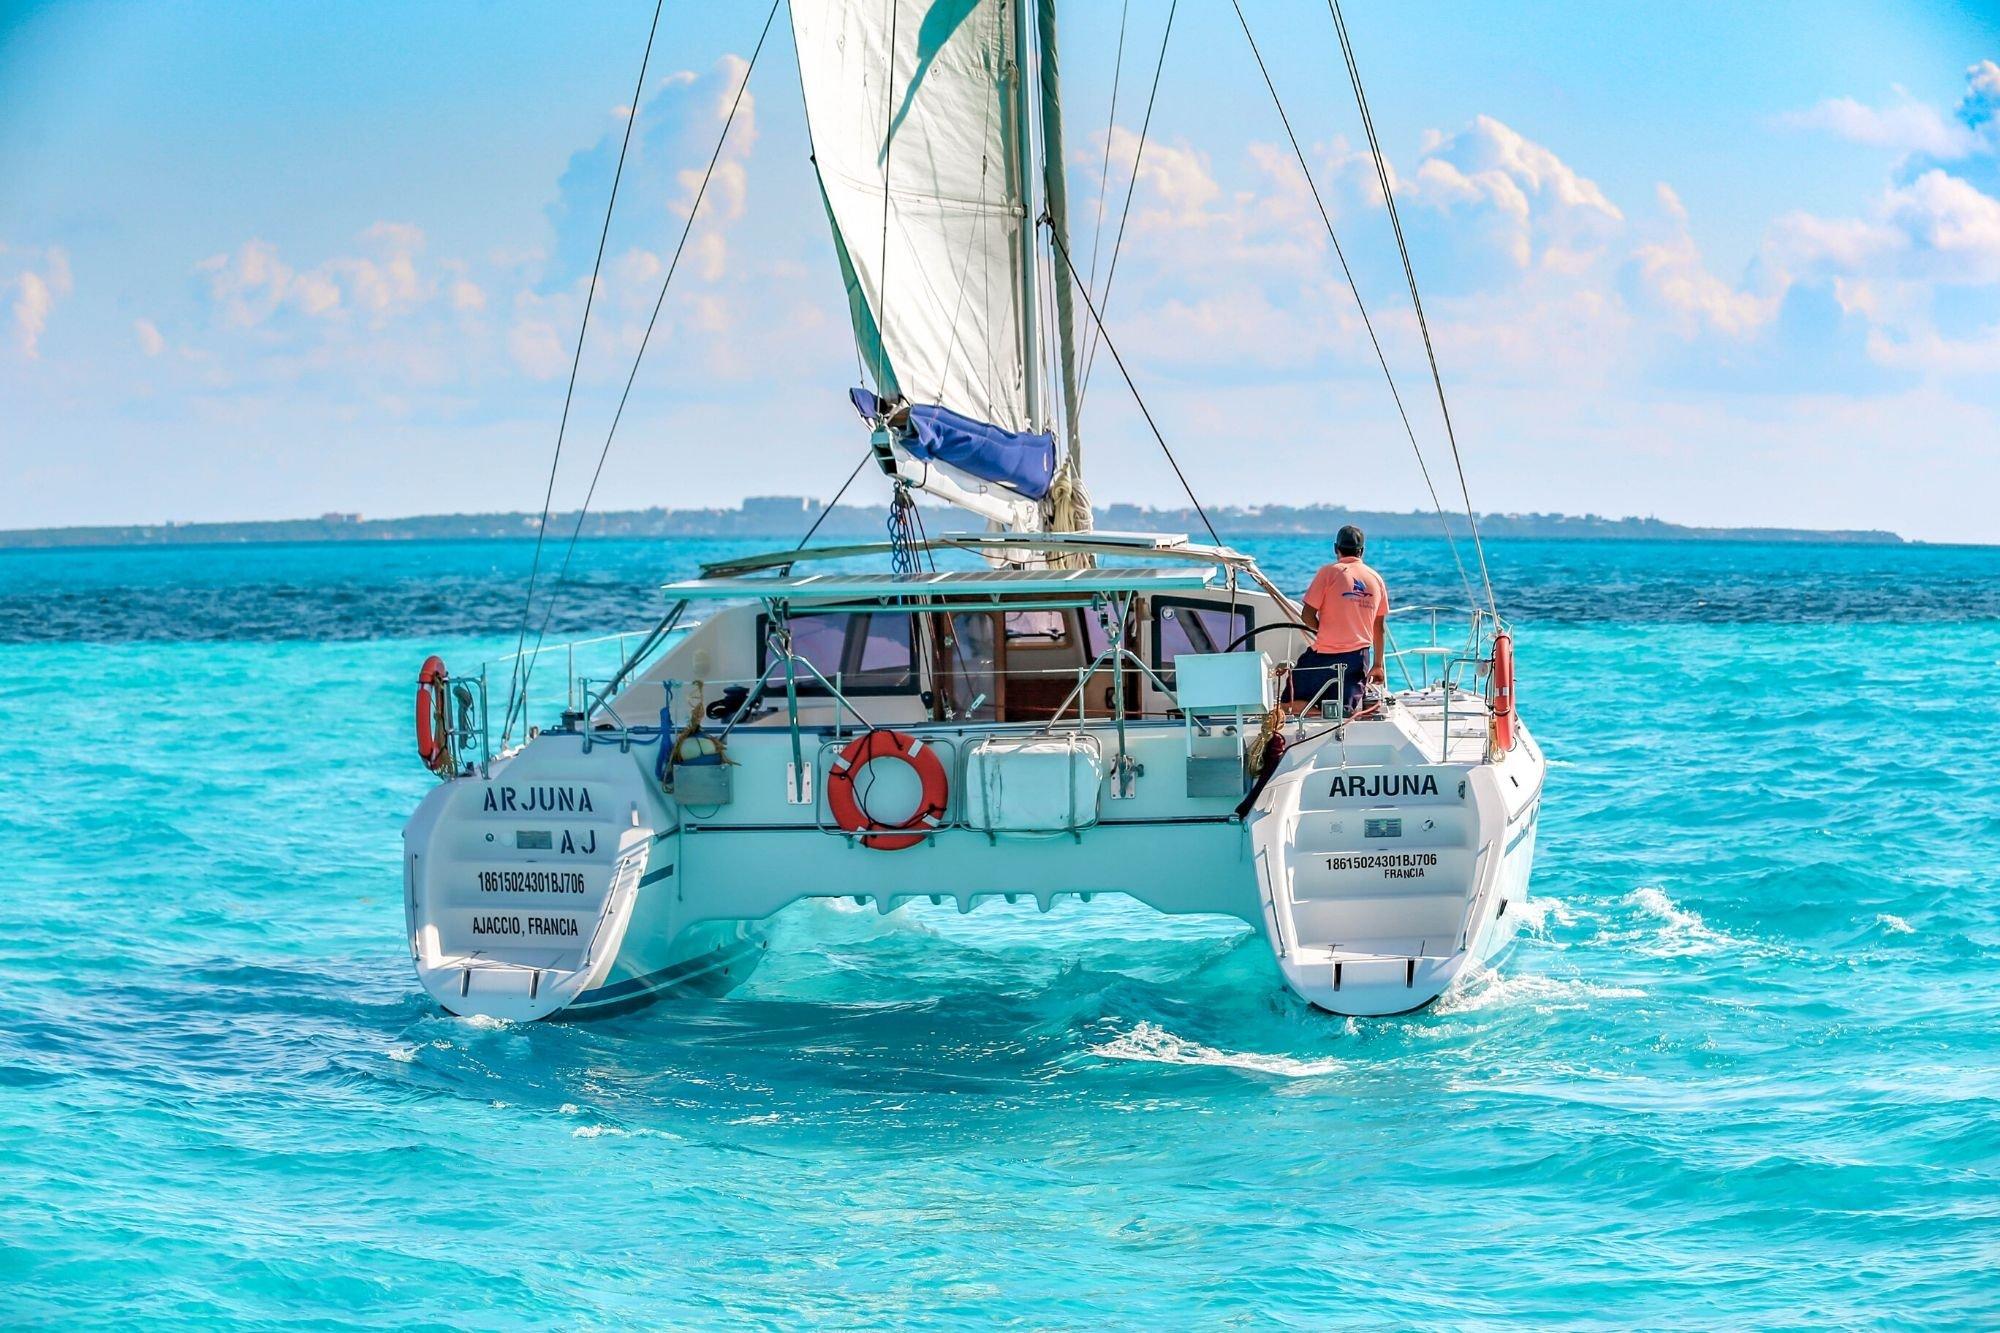 Arjuna - Isla Mujeres Catamaran Tour - Cancun Sailing - 4